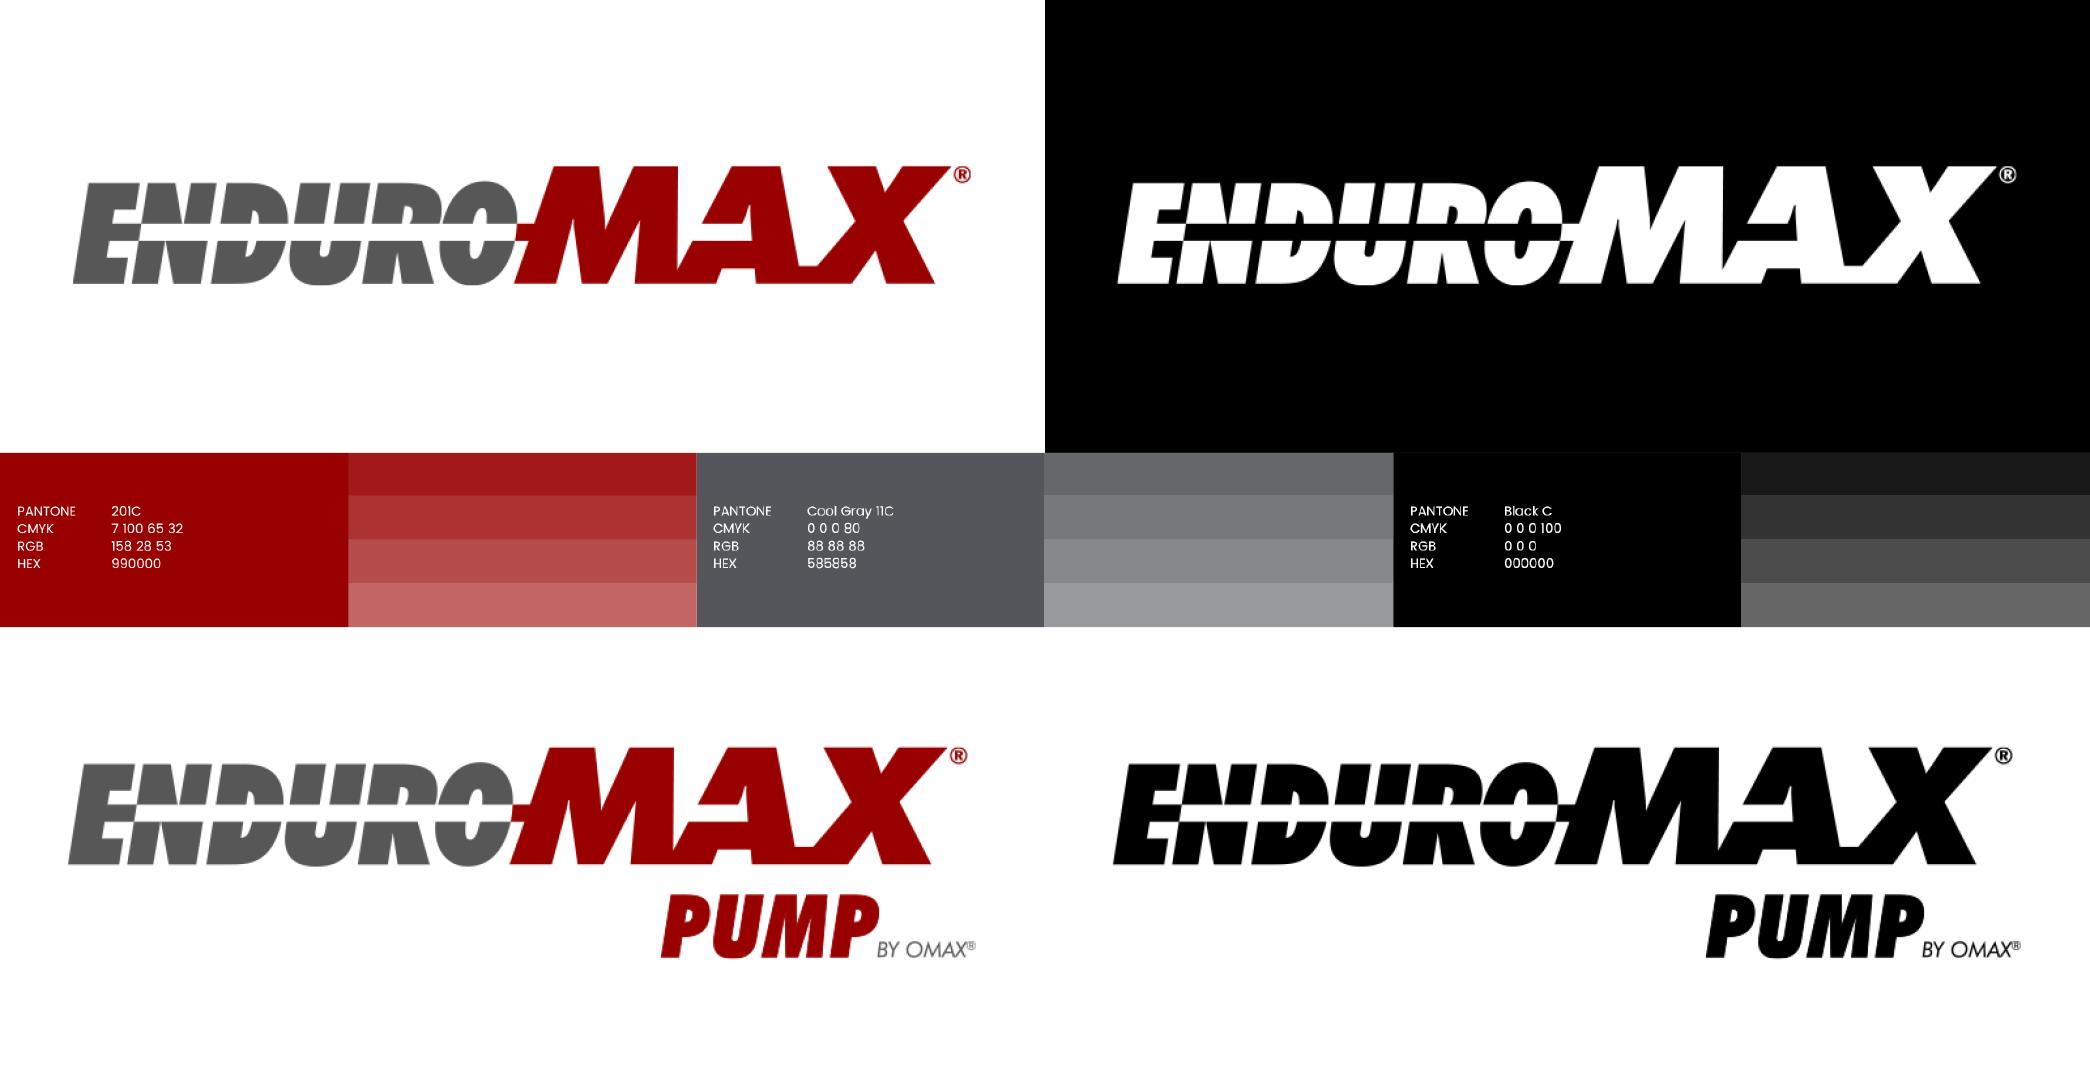 omax-enduromax-branding-style-guide